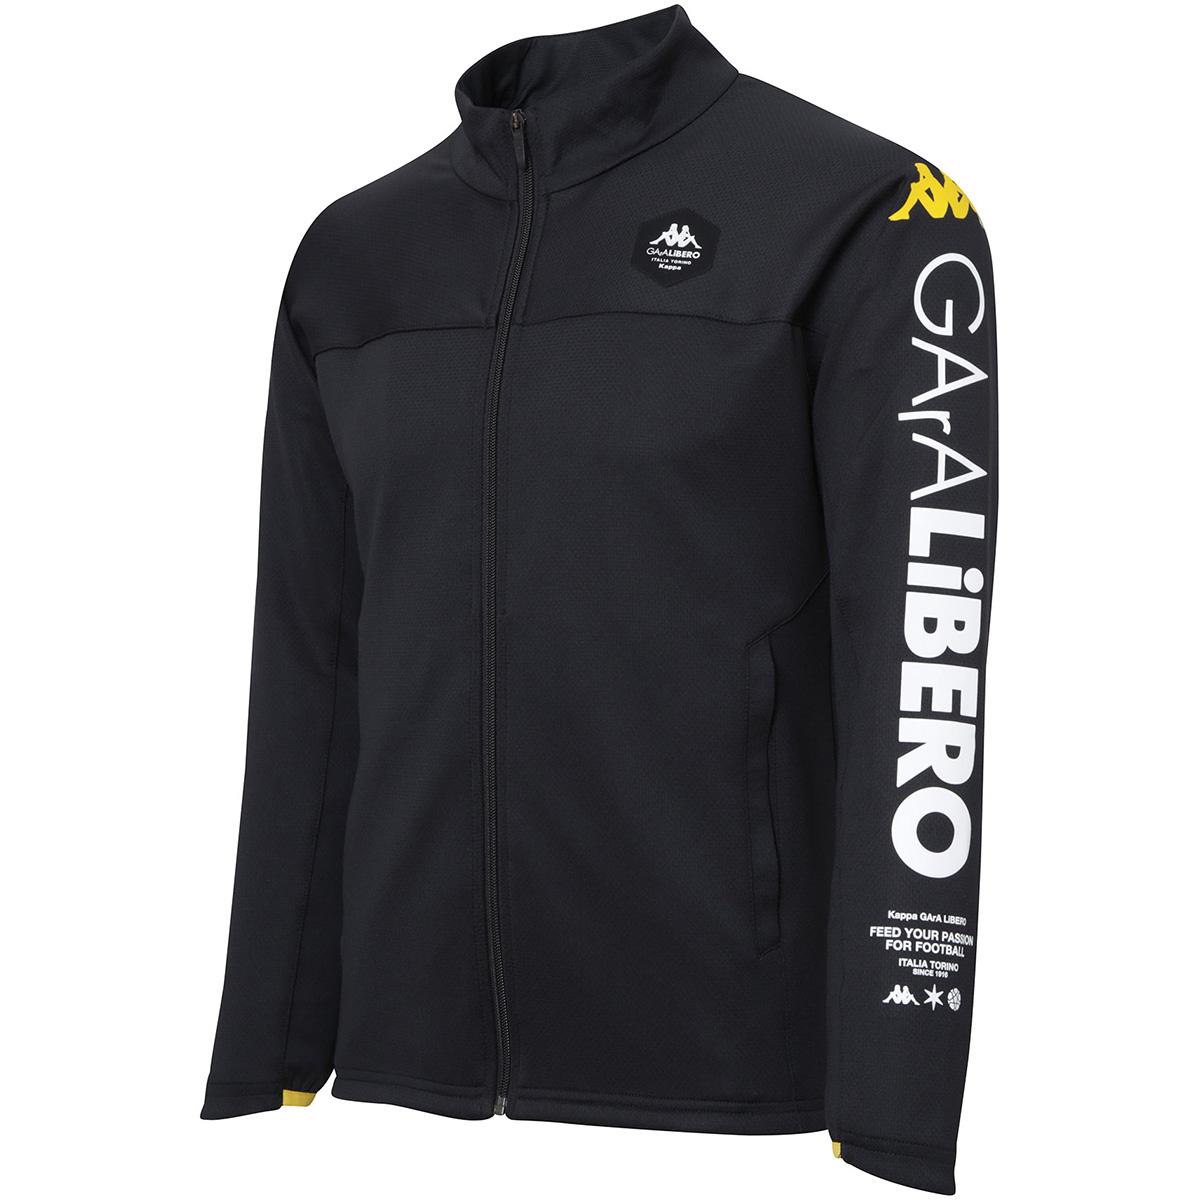 GArA LiBERO トレーニング ストレッチジャケット